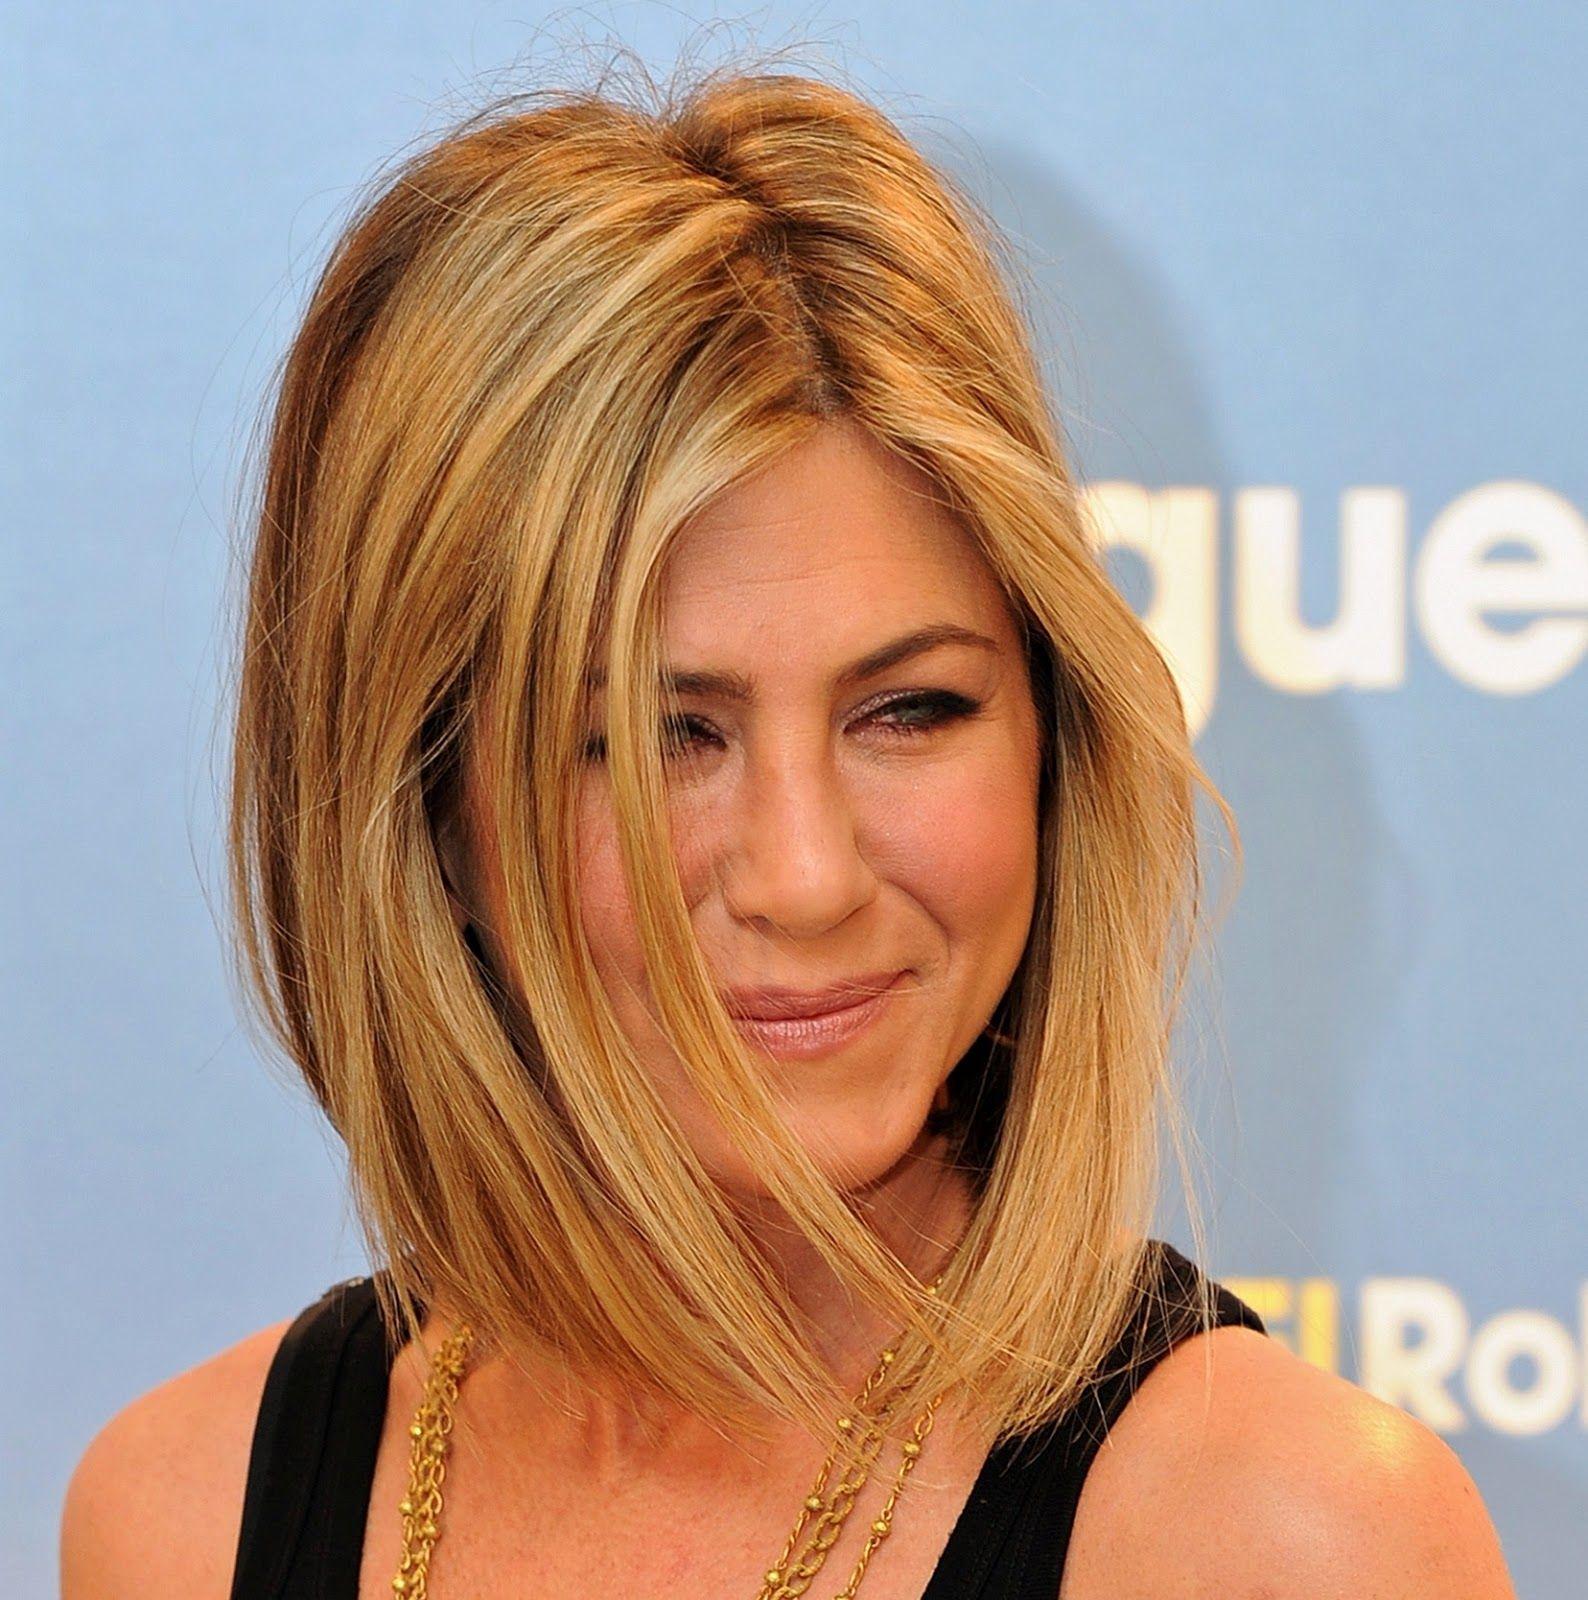 Jennifer Aniston Hairstyles | Best Jennifer Aniston Bob Hairstyles